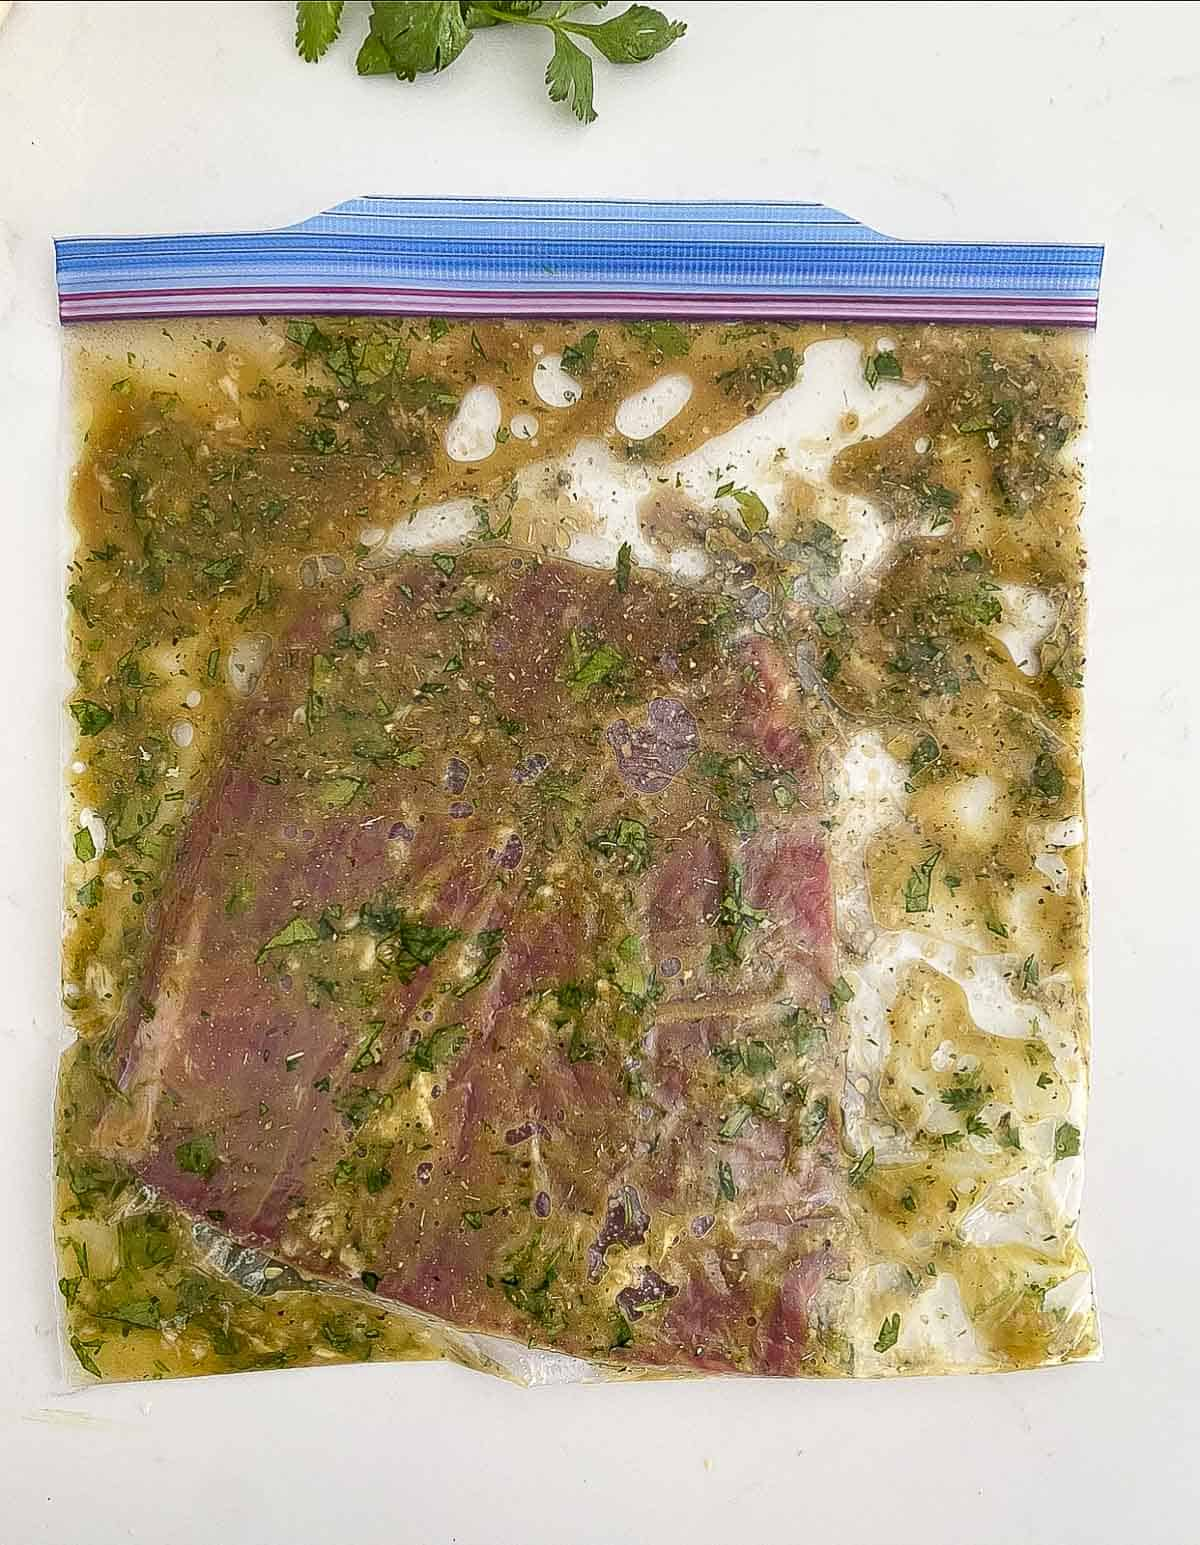 Flank steak with carne asada marinade in a plastic bag.